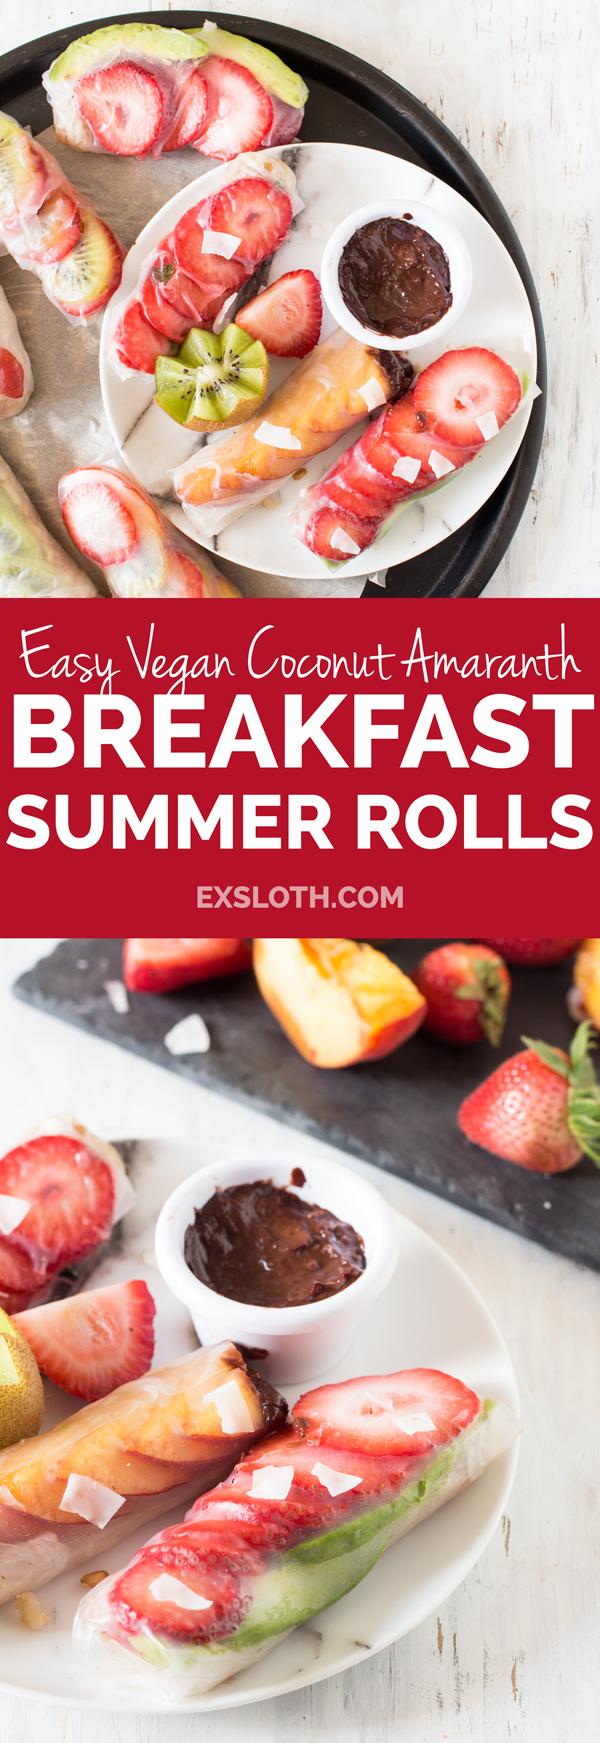 Easy Vegan Breakfast Summer Rolls (rice paper rolls or fresh spring rolls) via @ExSloth | ExSloth.com